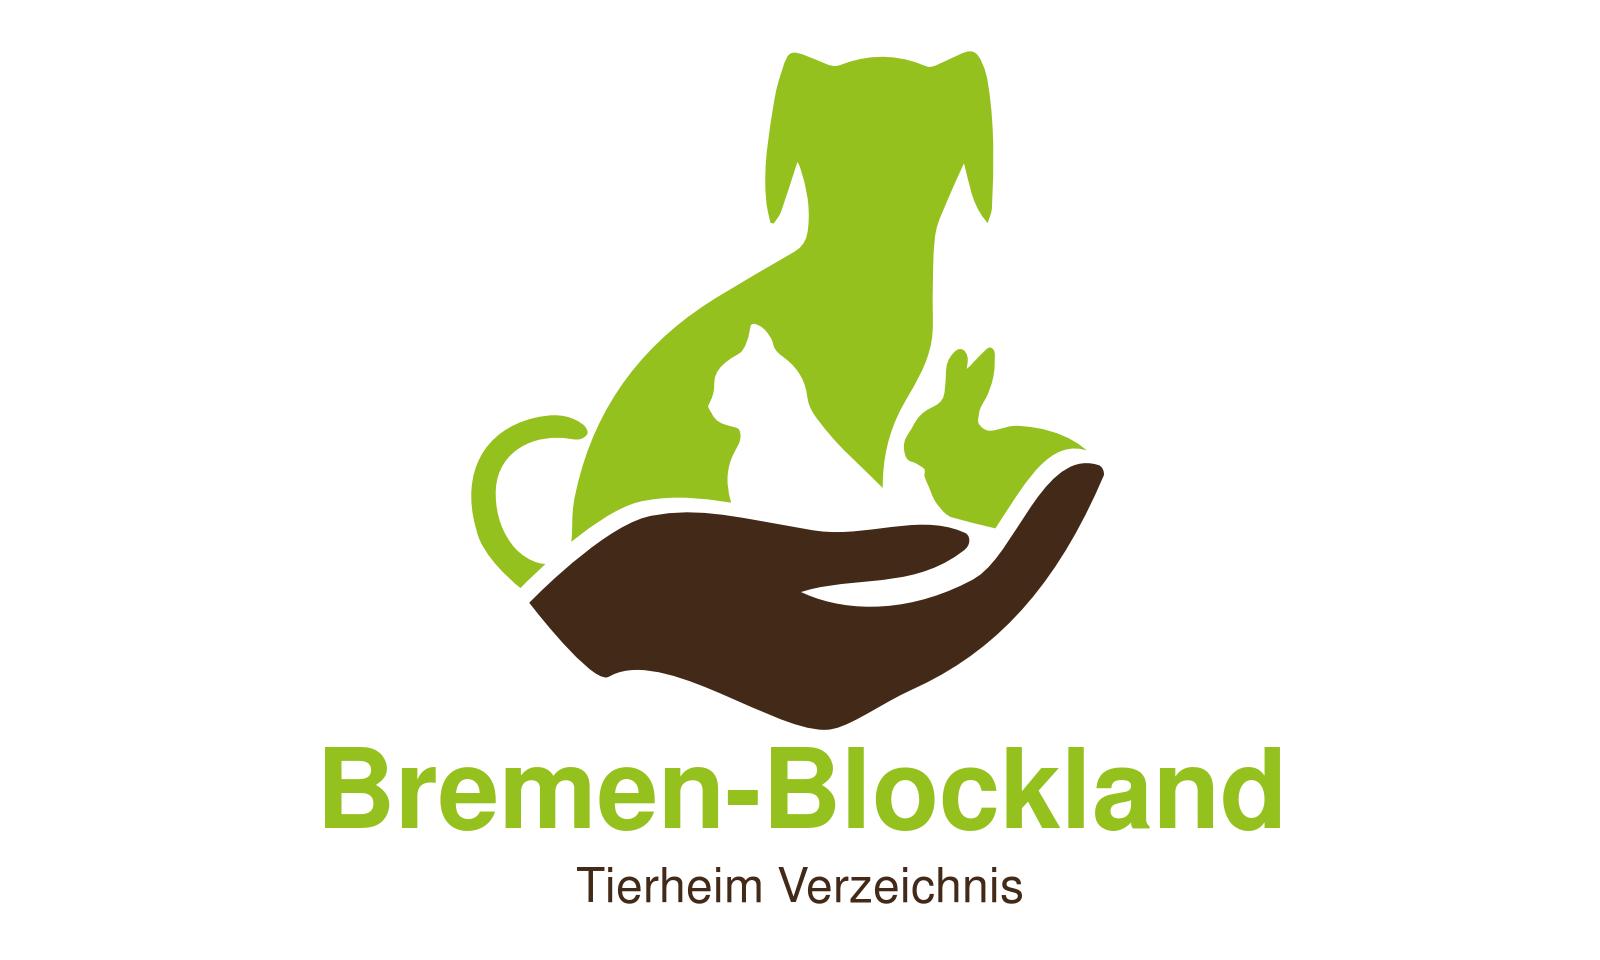 Tierheim Bremen Blockland